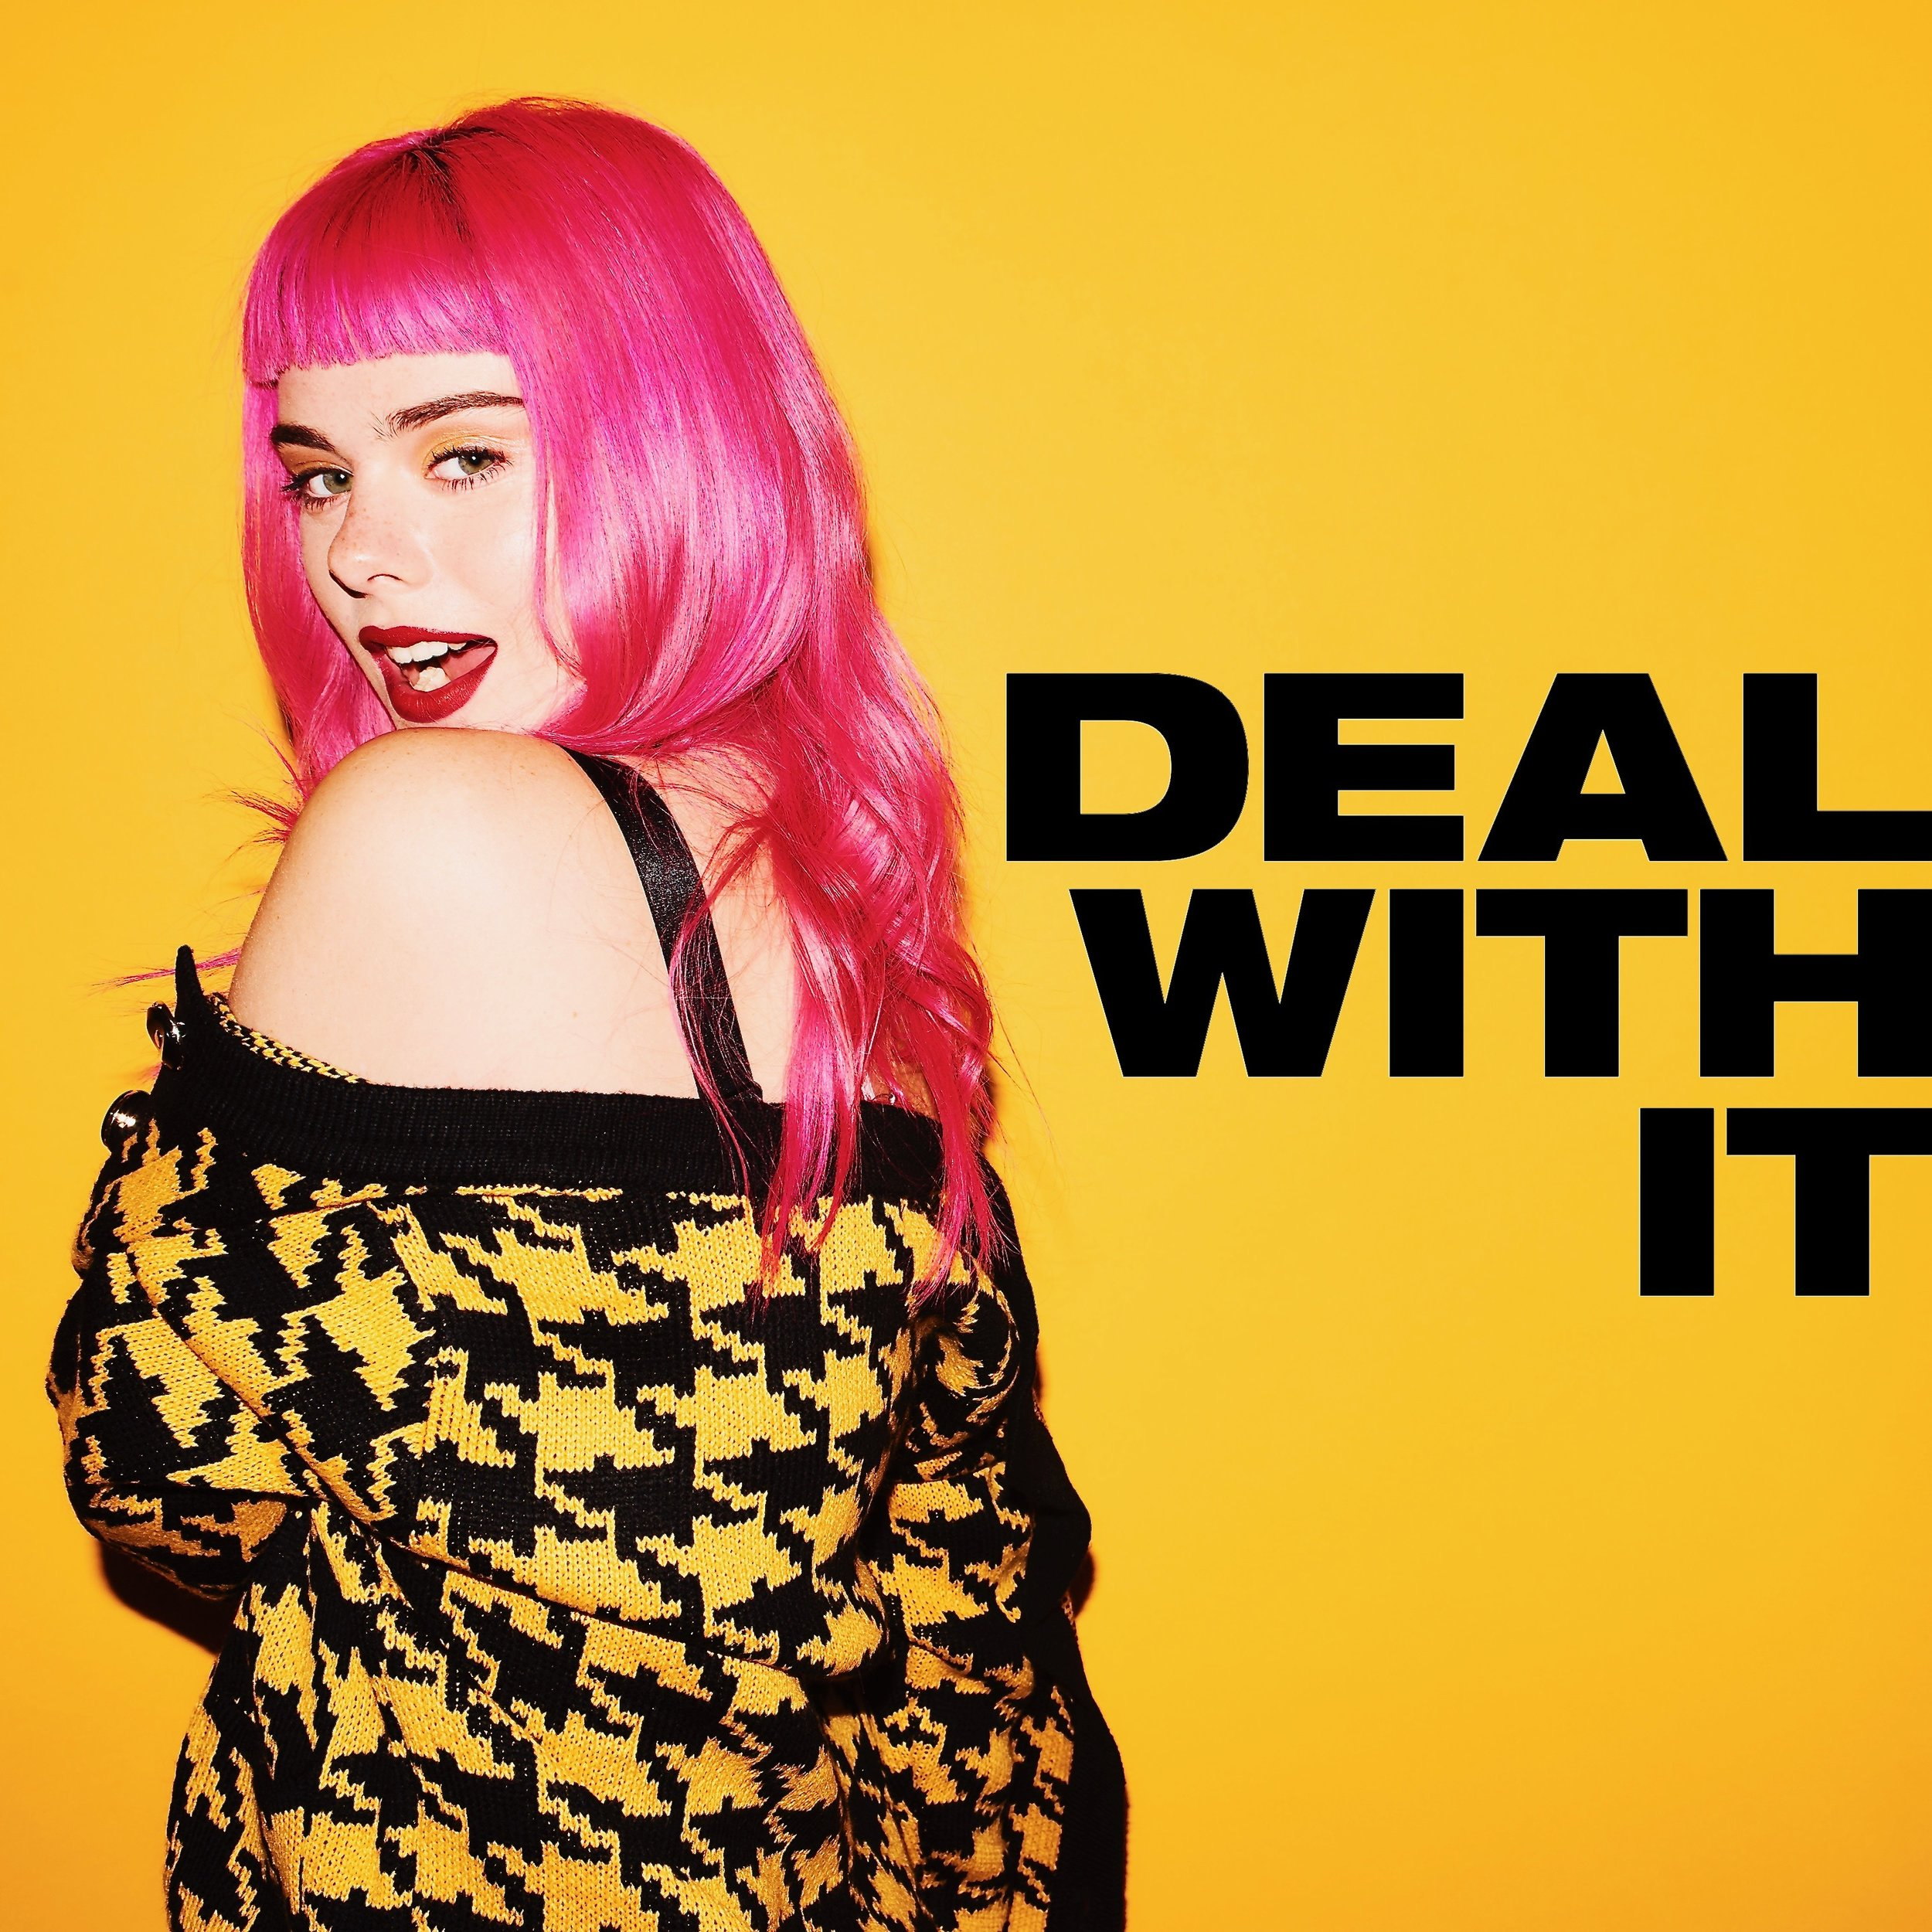 Girli#Deal With It#Bella Howard